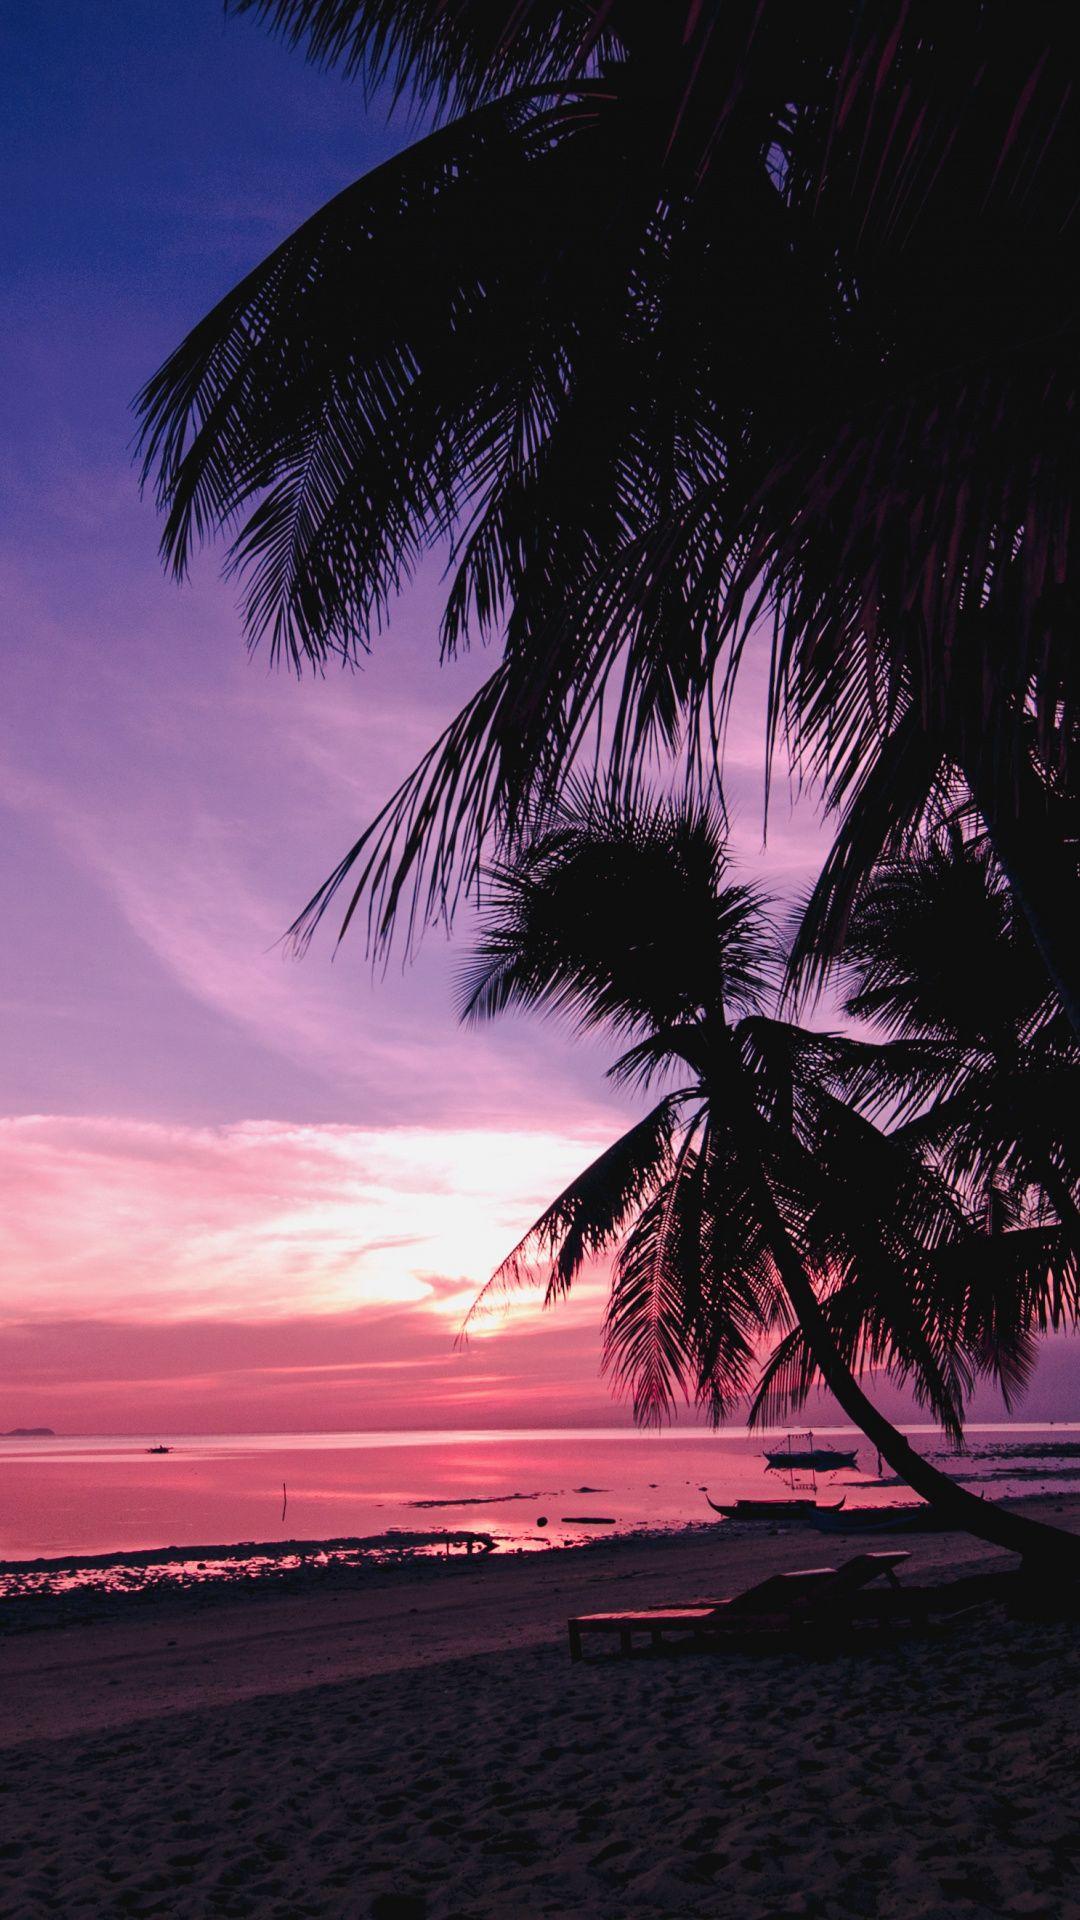 Palm Trees Beach Nature Sunset Wallpaper Sunset Wallpaper Tree Sunset Wallpaper Palm Trees Wallpaper